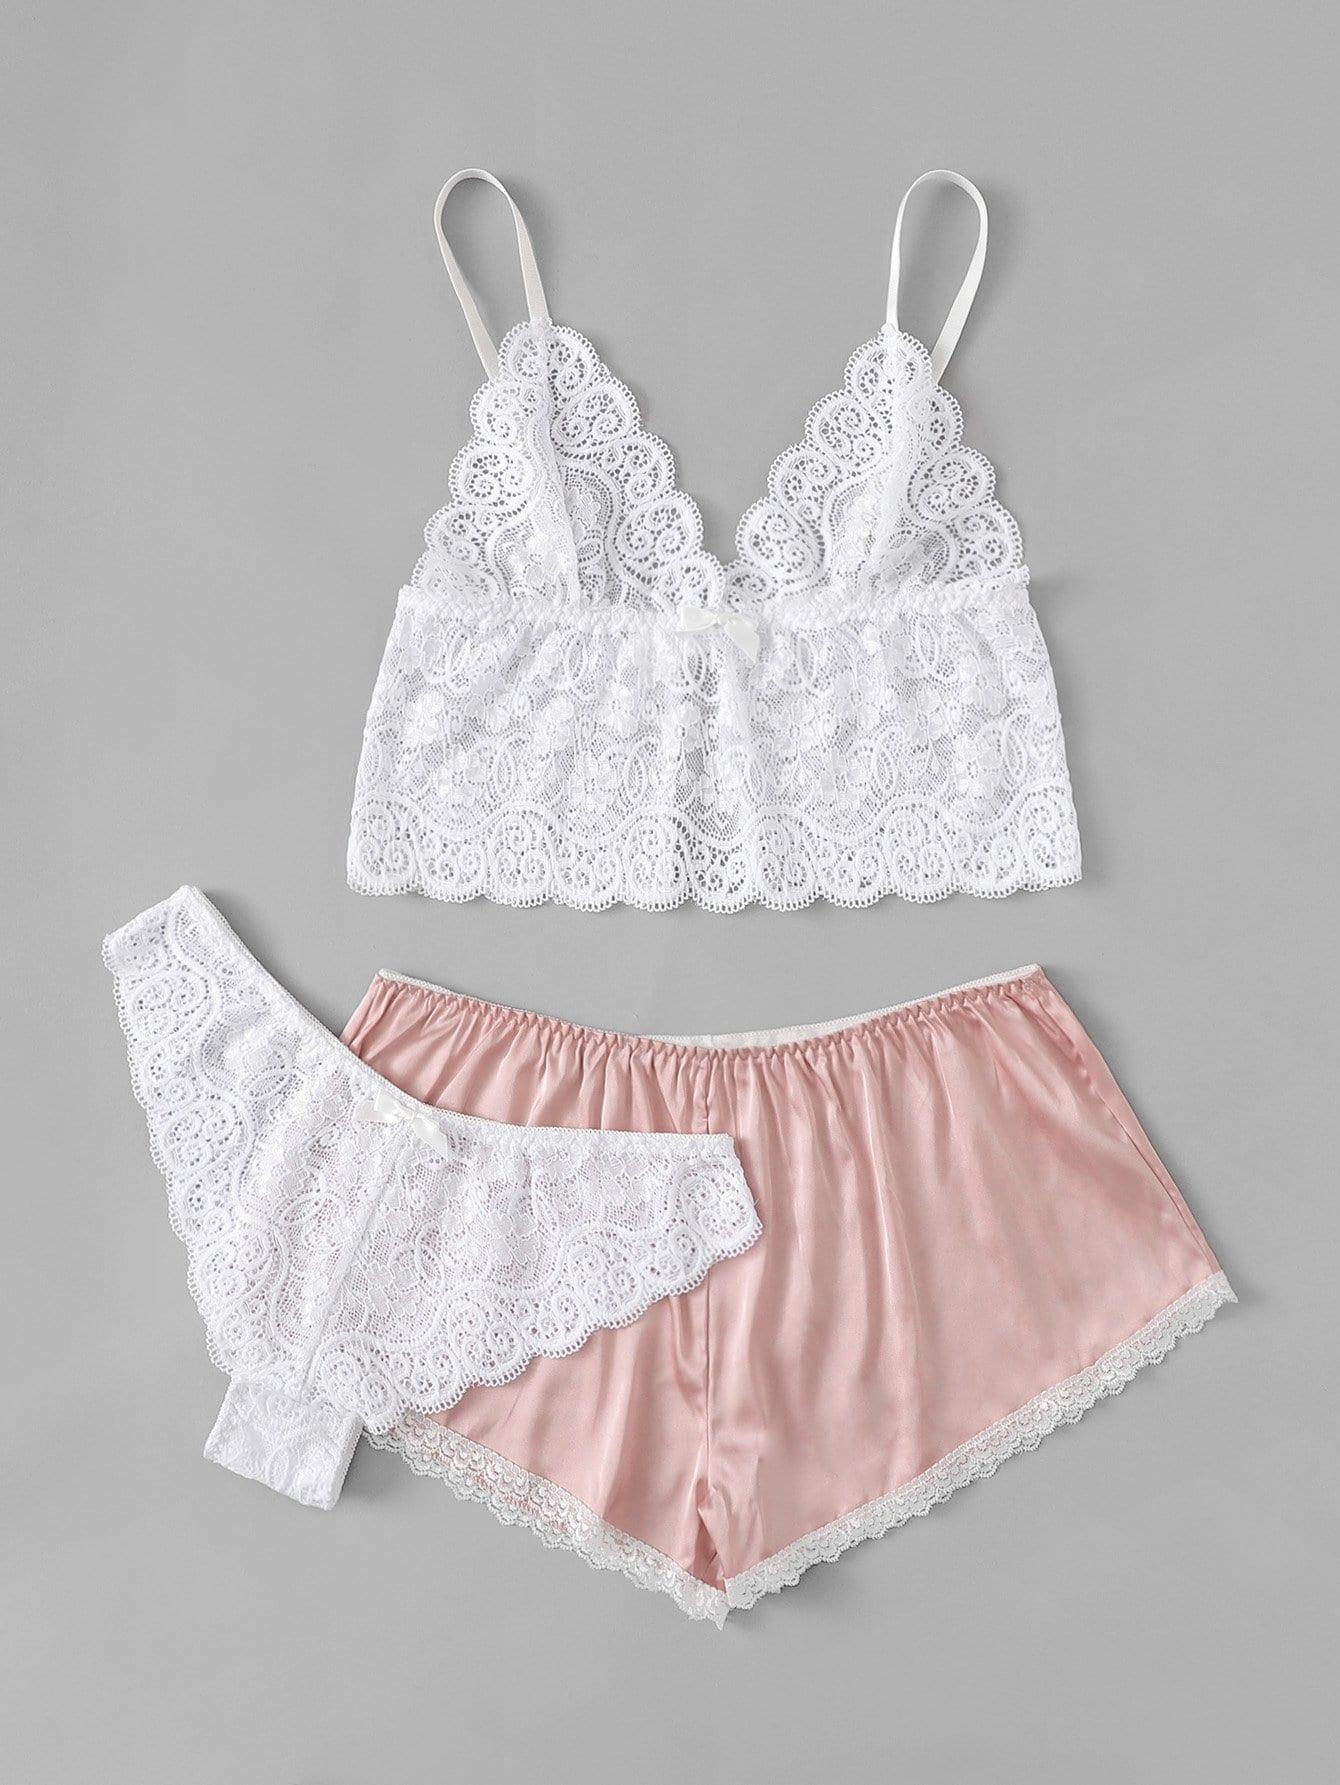 Scalloped Trim Cami Top & Shorts Panty 3pcs